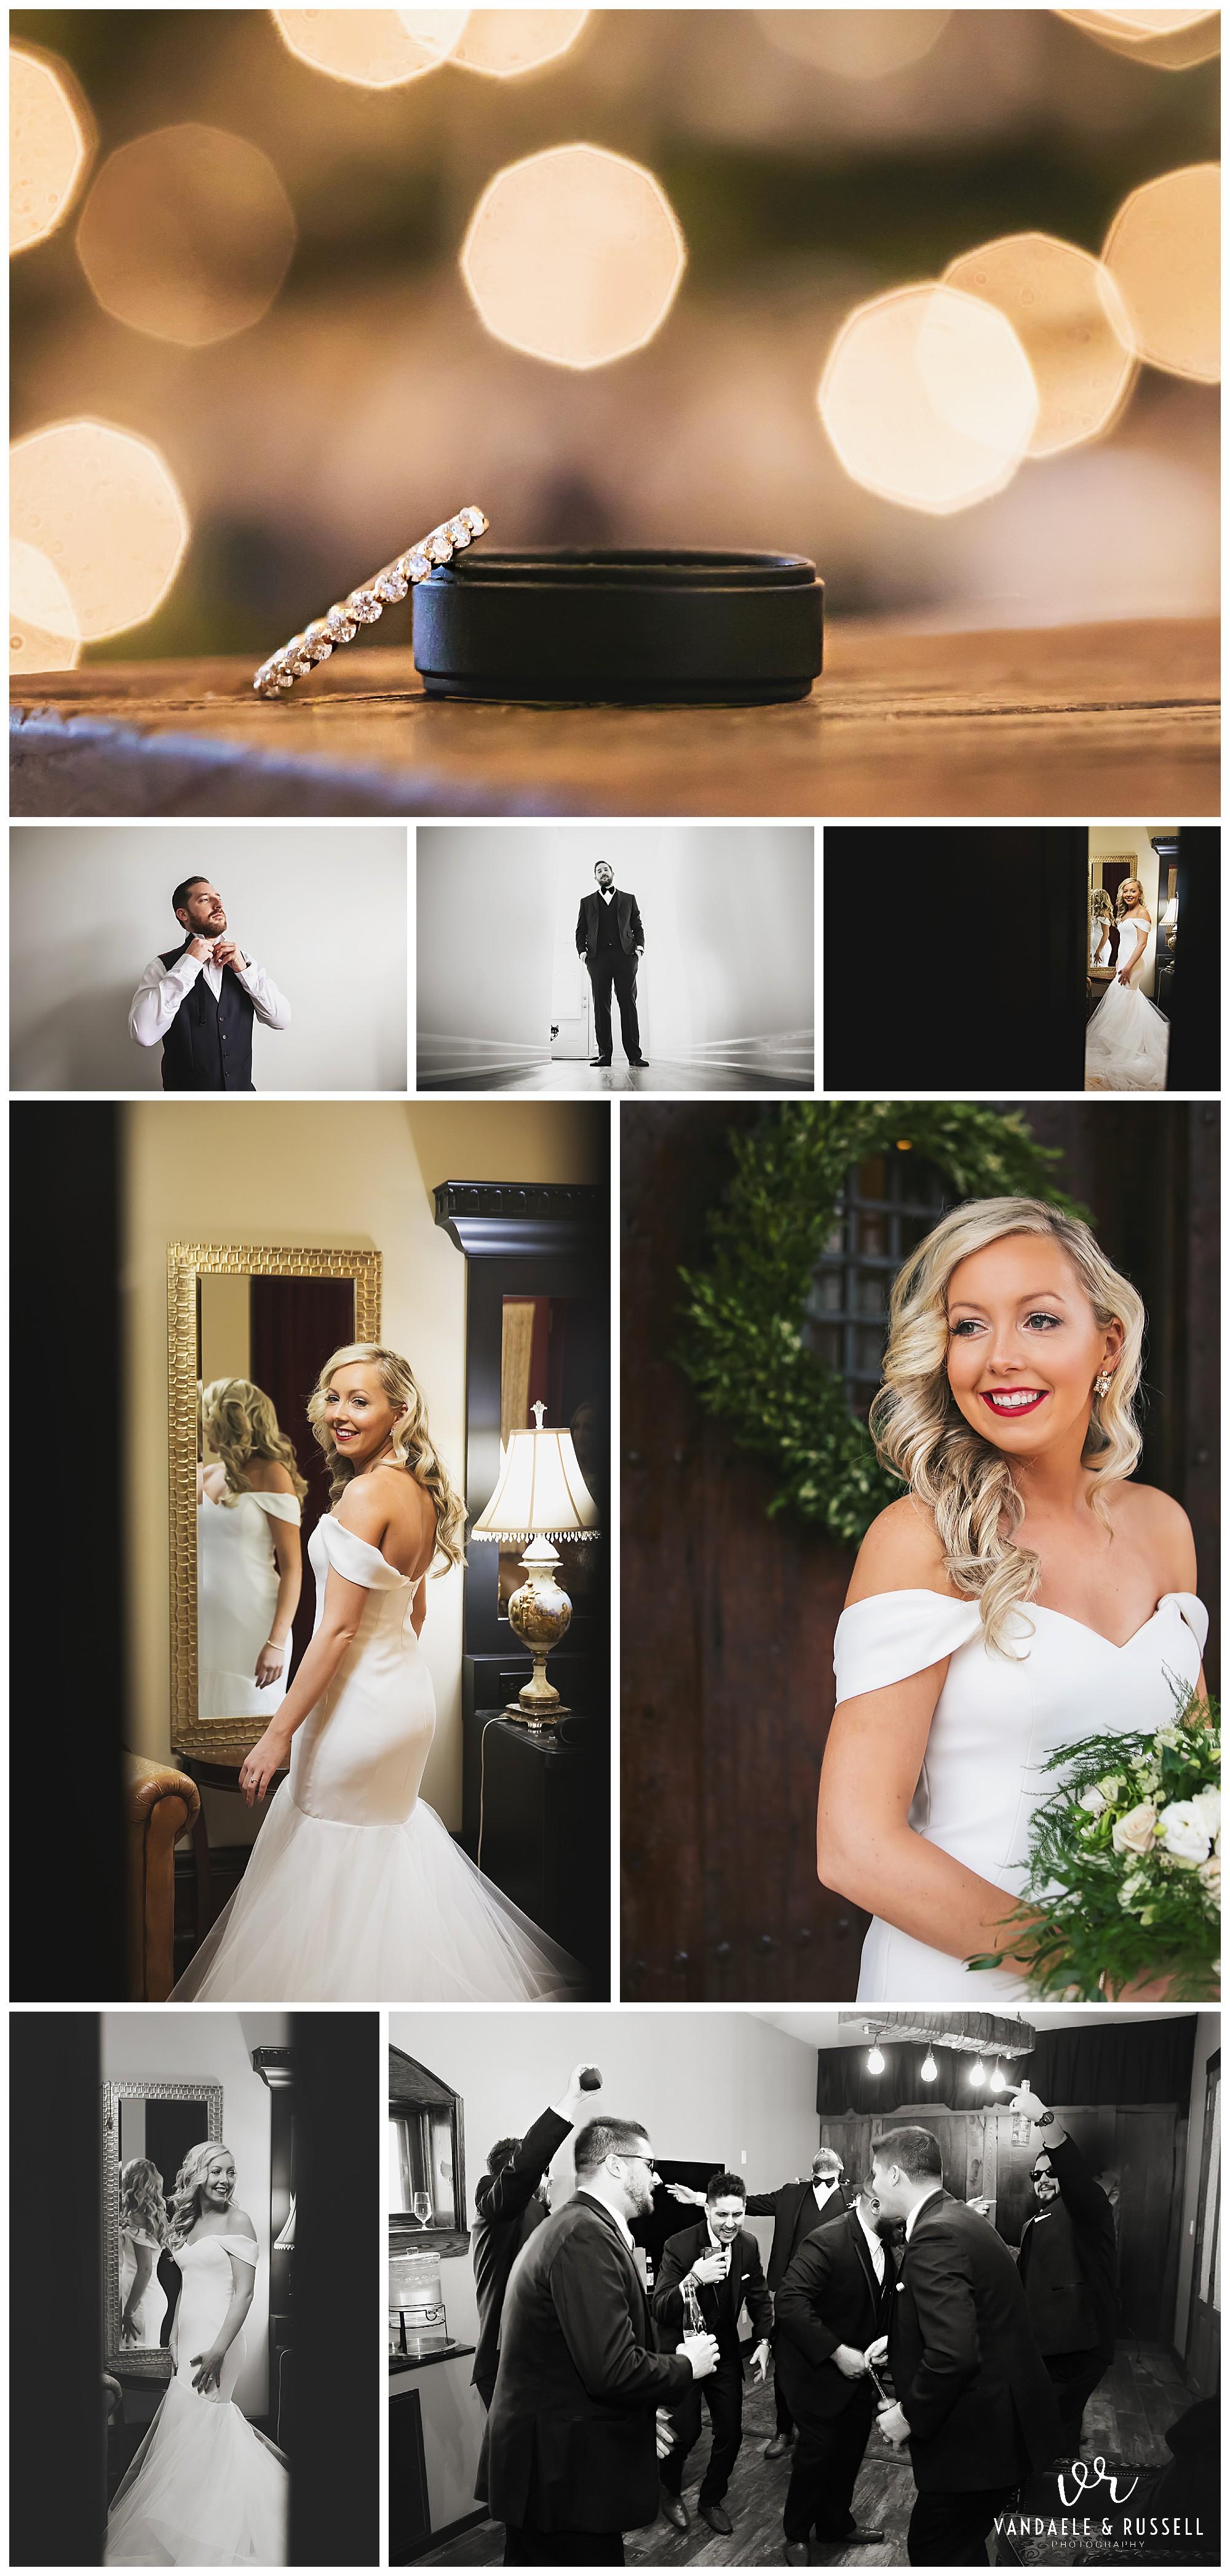 Hacienda-Sarria-Wedding-Photos-NYE-Michelle-Matt-VanDaele-Russell_0008.jpg